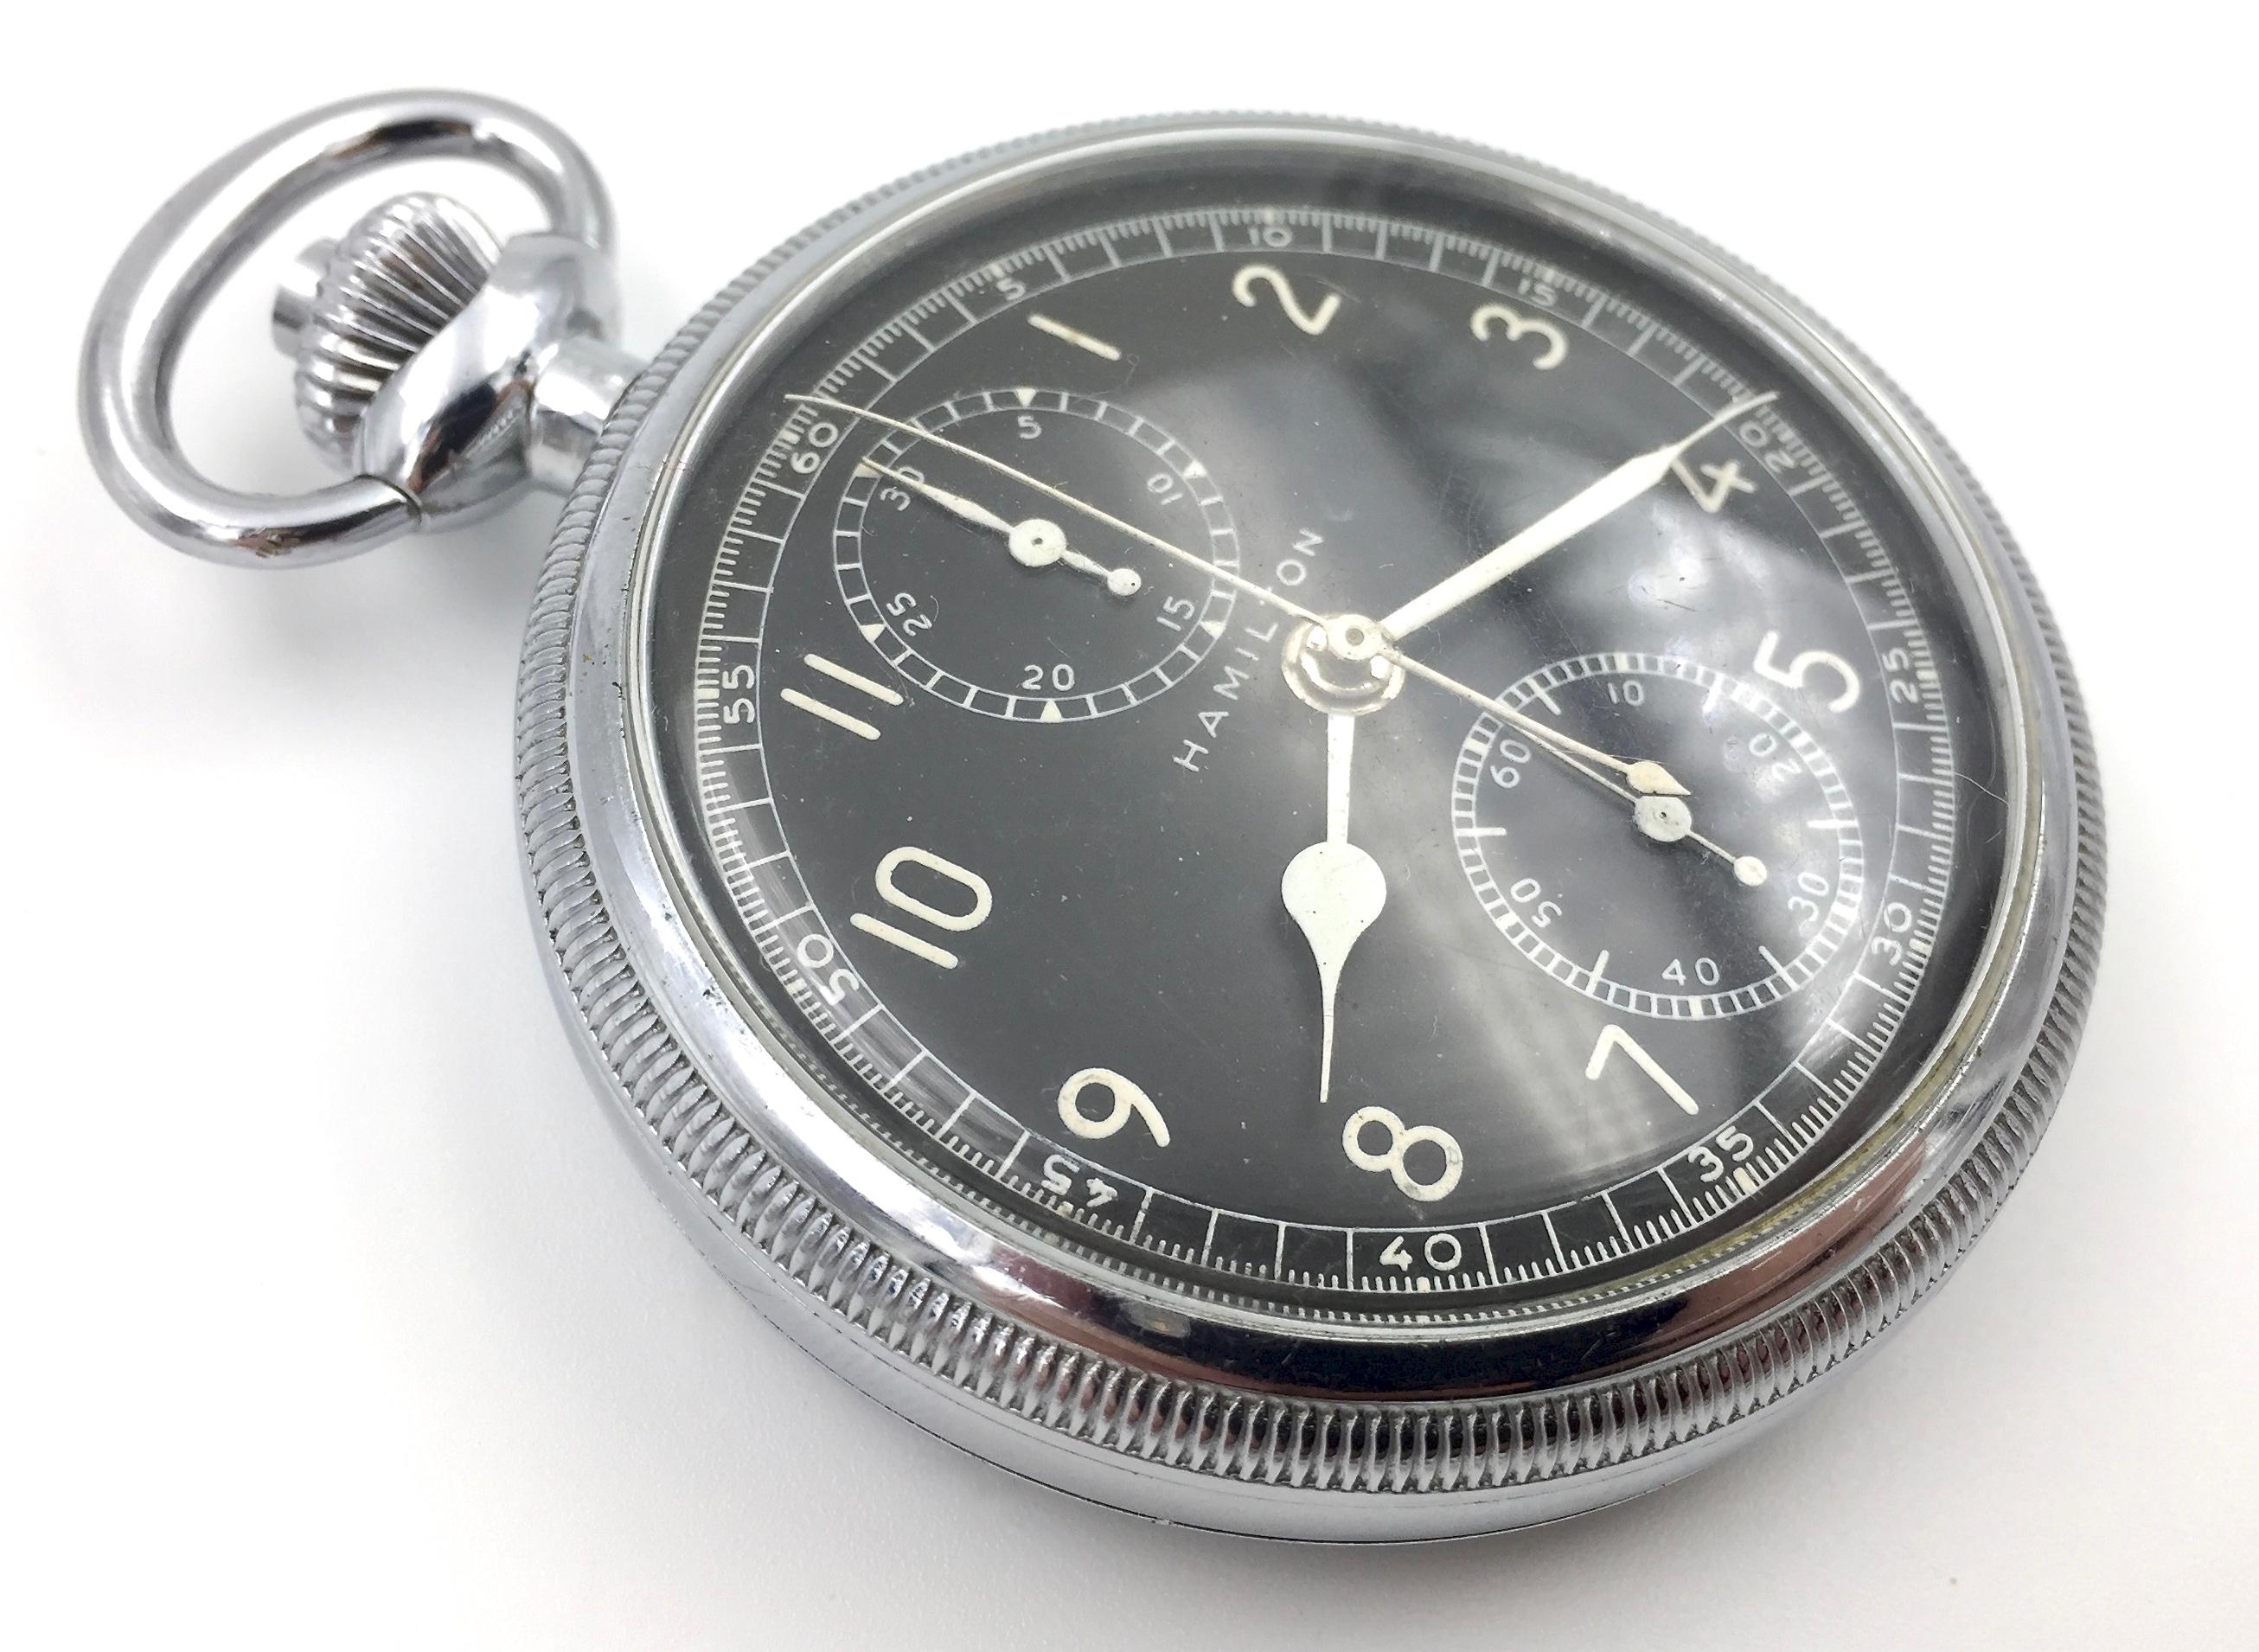 Dating hamilton wrist watches